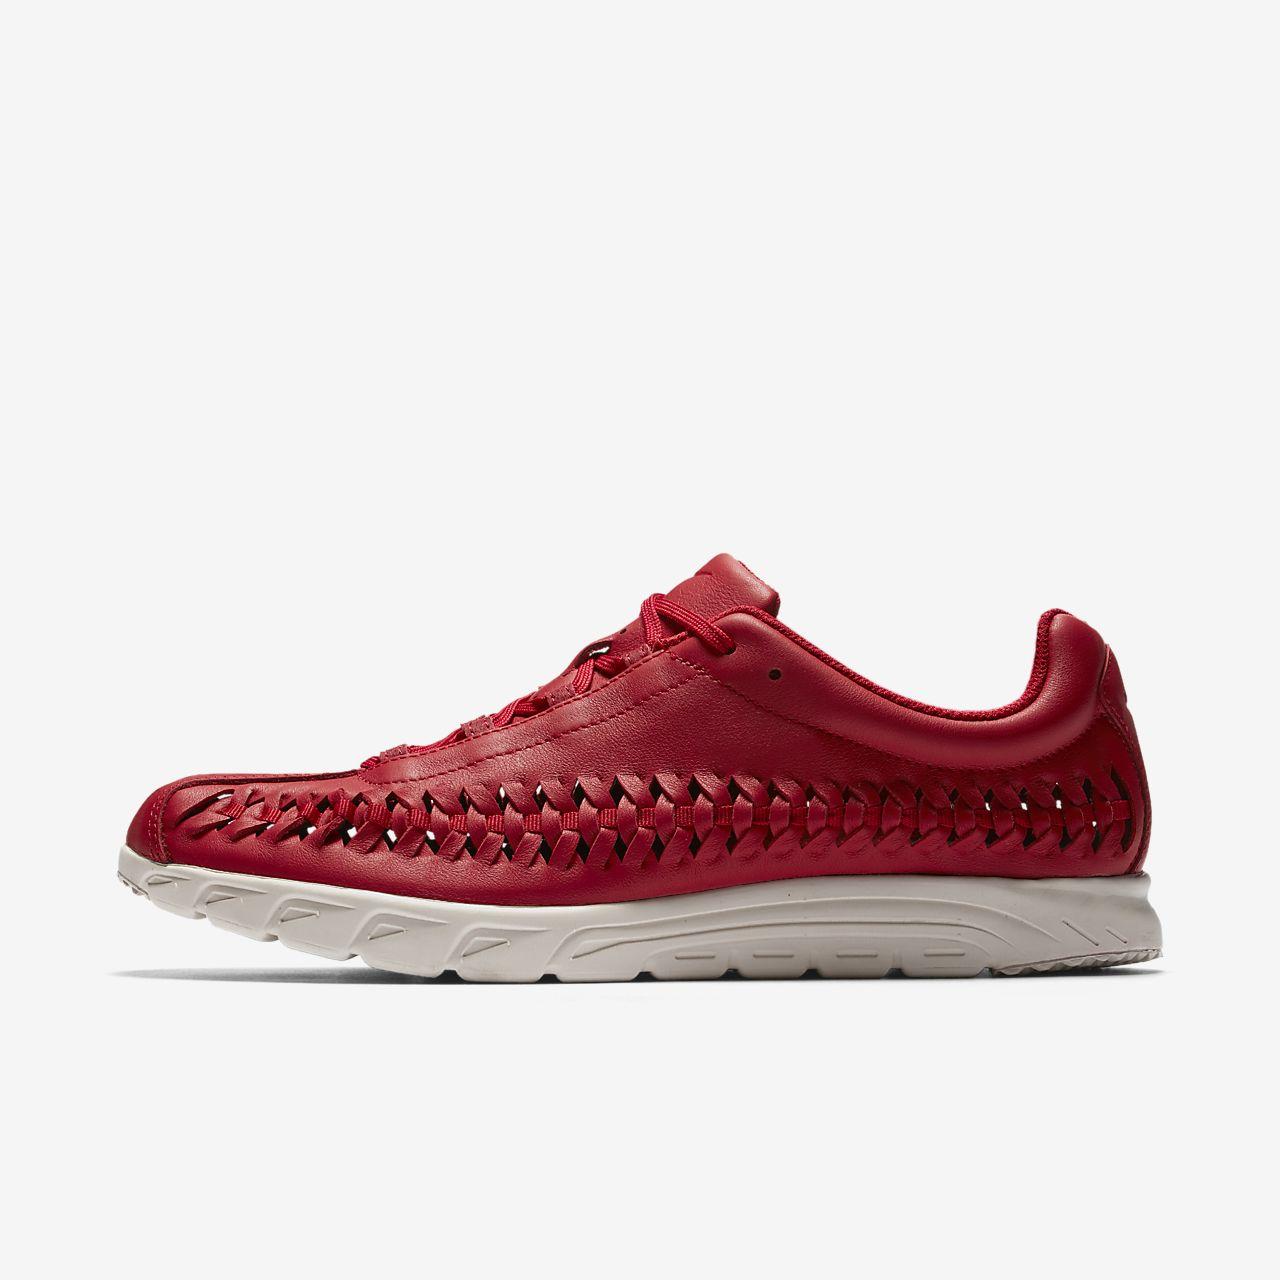 los angeles 9339a d5b77 ... Nike Mayfly Woven - sko til mænd